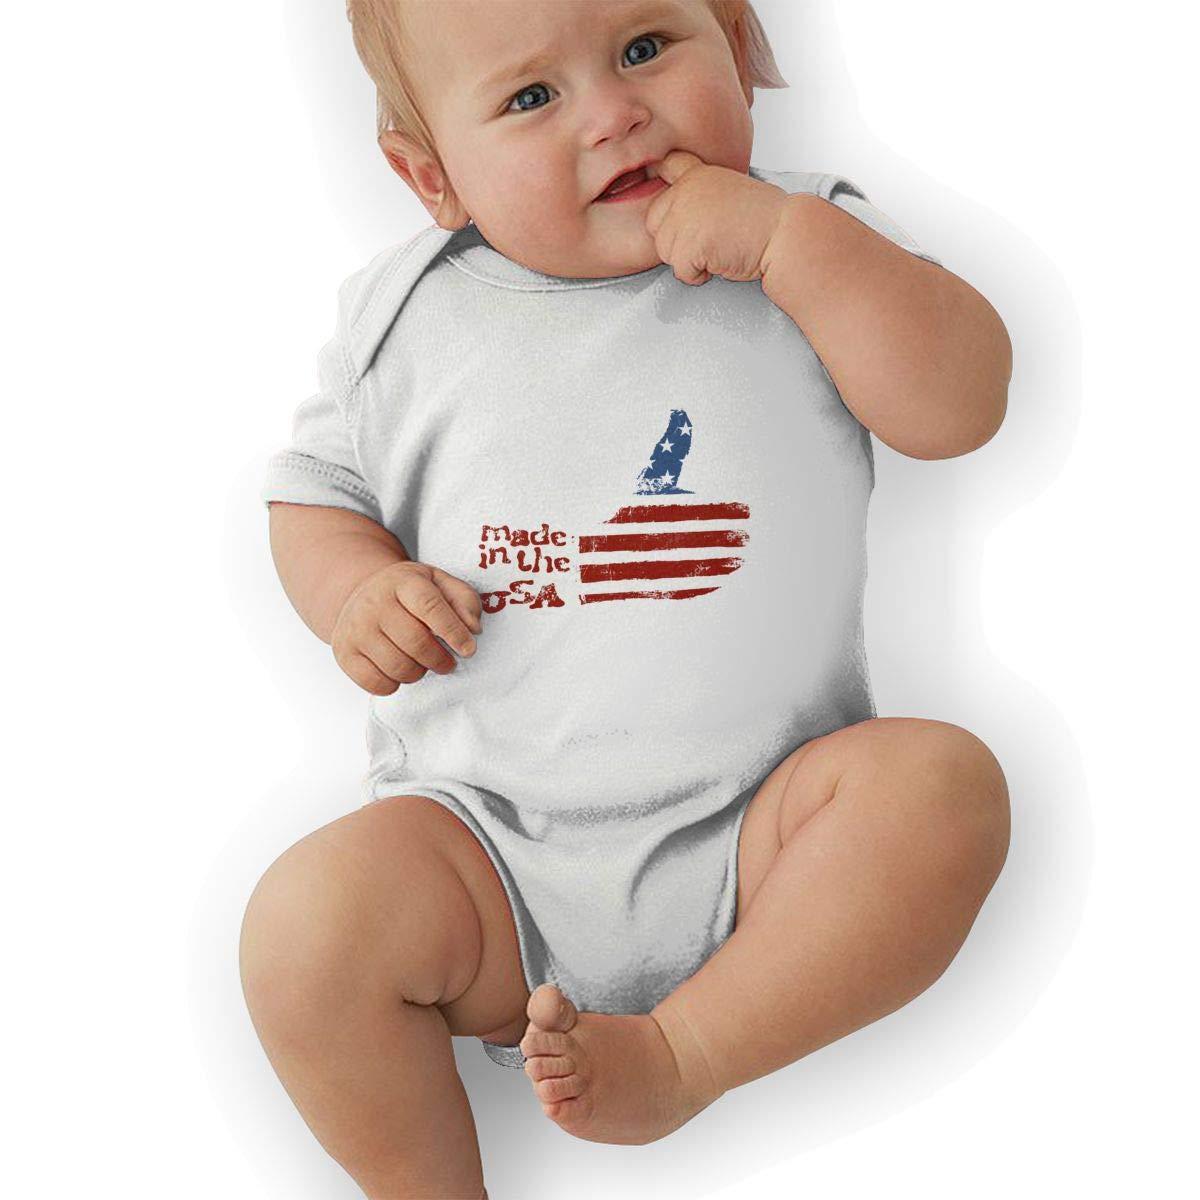 Newborn Baby Girls Bodysuit Short-Sleeve Onesie Made in The USA Print Jumpsuit Autumn Pajamas